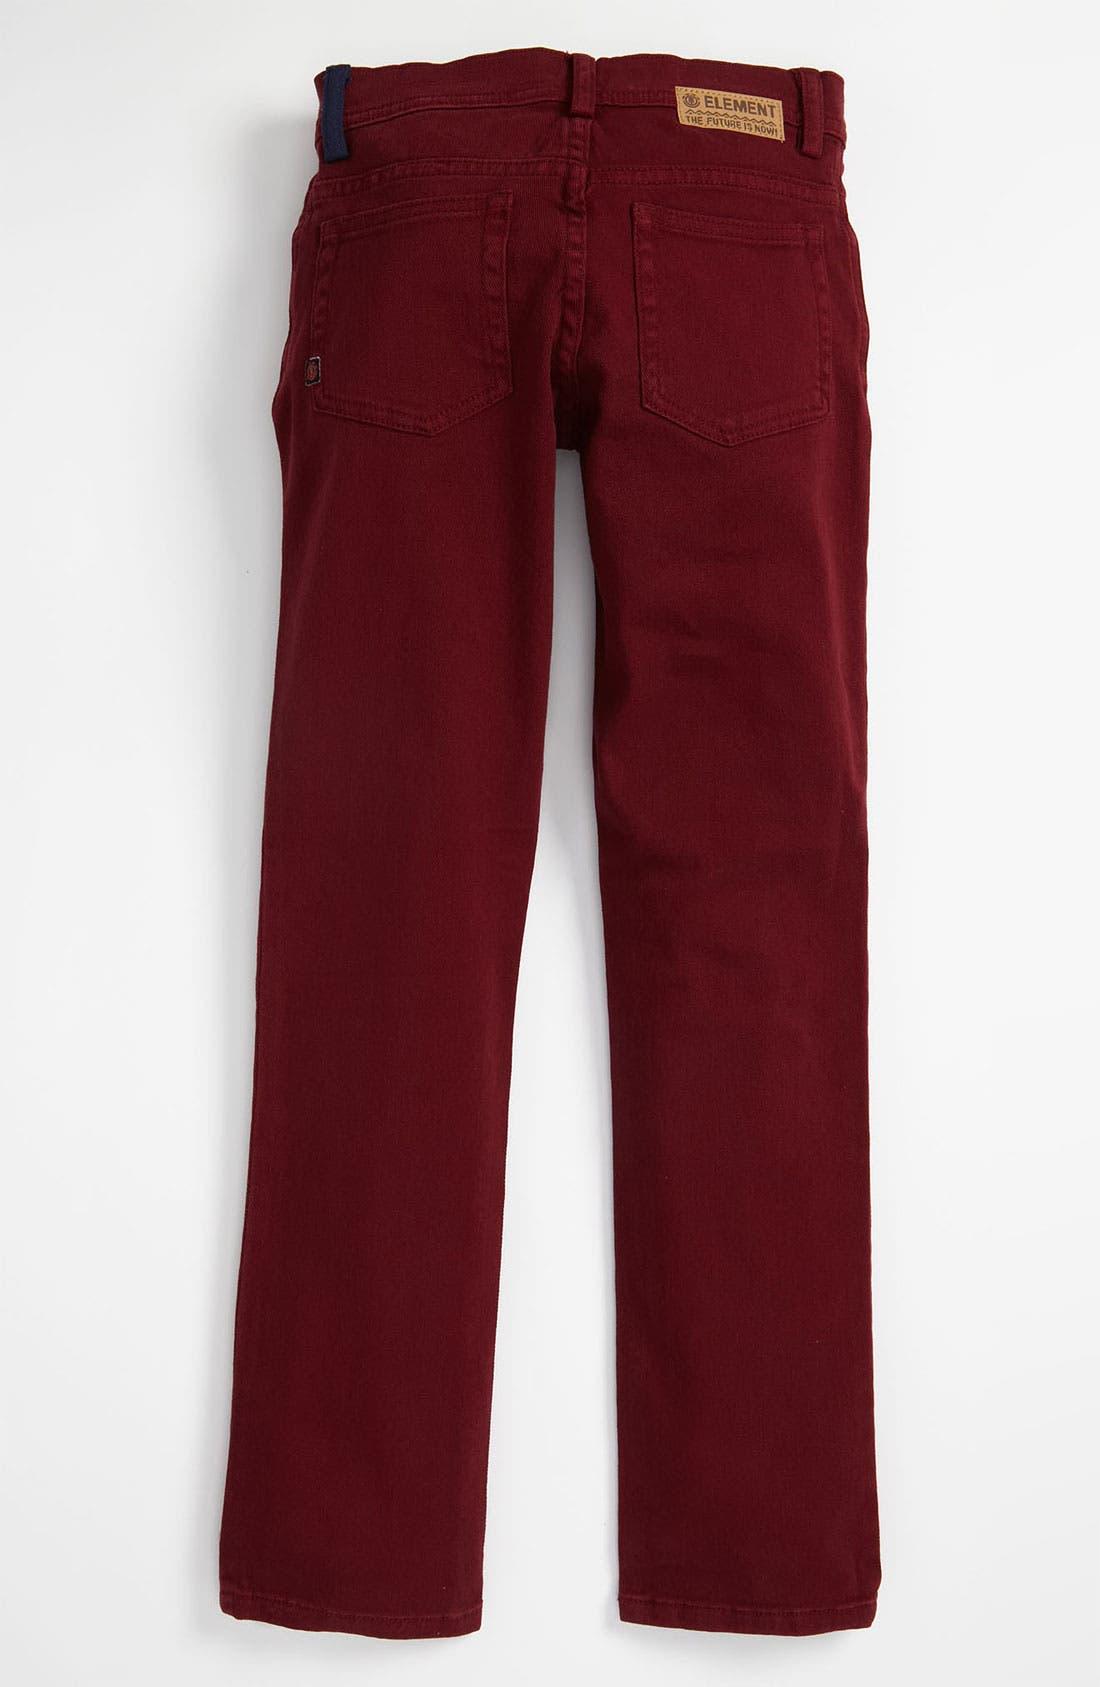 Alternate Image 1 Selected - Element 'Crosstown' Jeans (Big Boys)